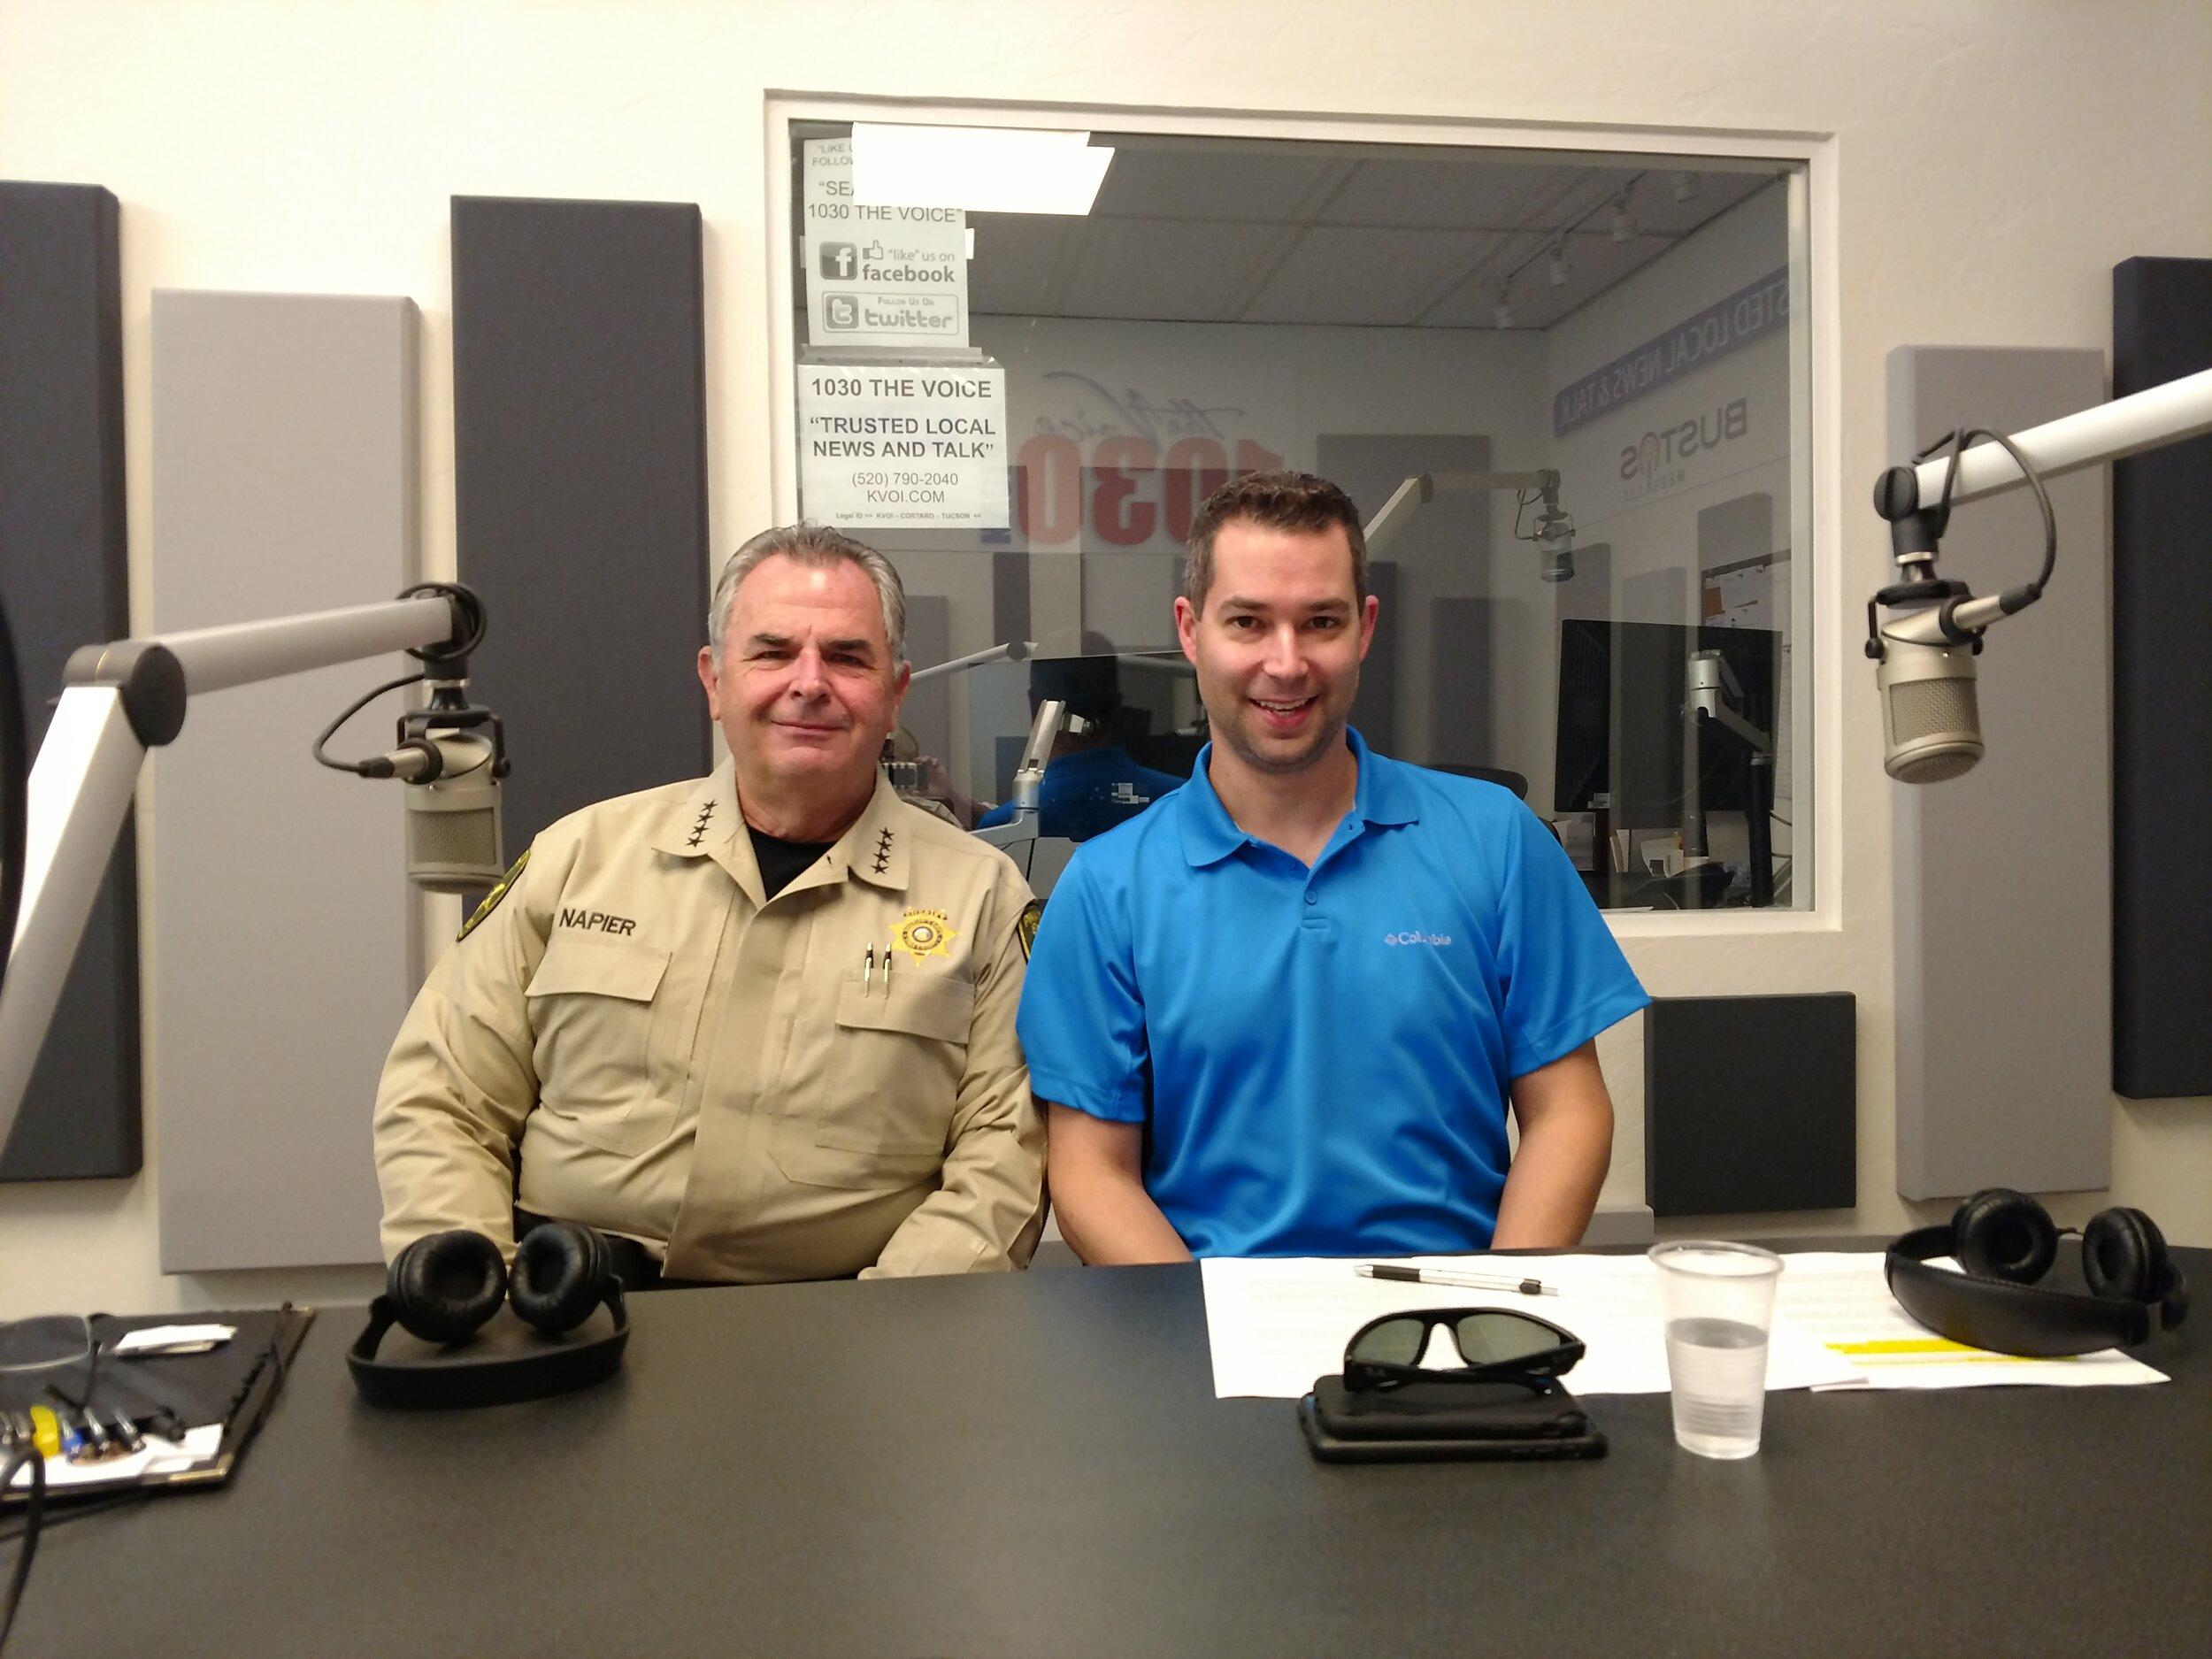 Sherrif Napier and TPD Lt. Colin King